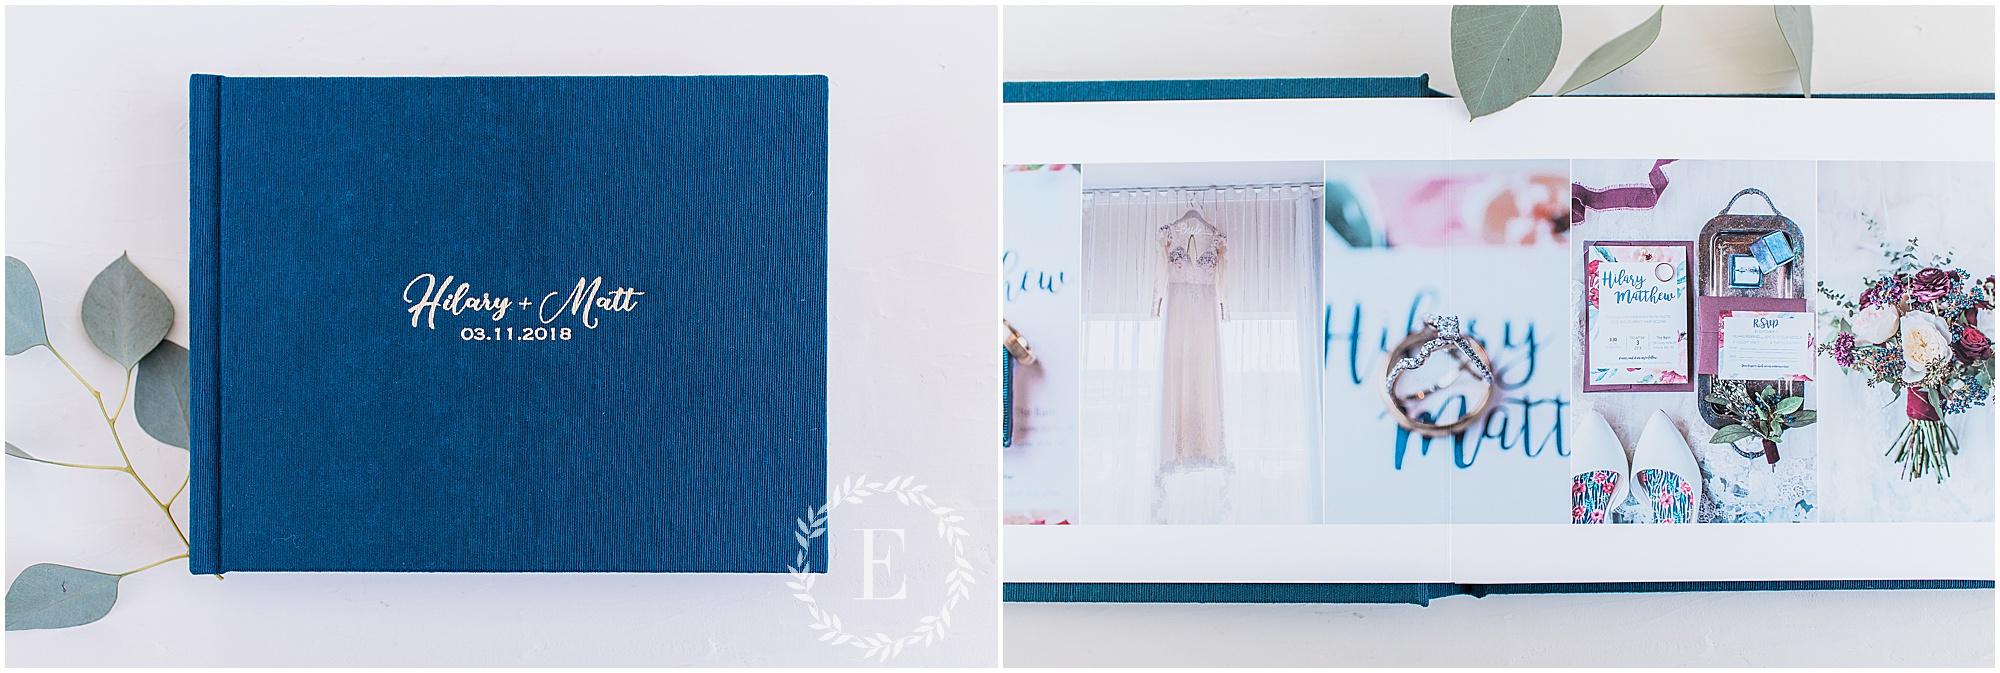 0002 Ottawa Wedding Album - Photography by Emma.jpg